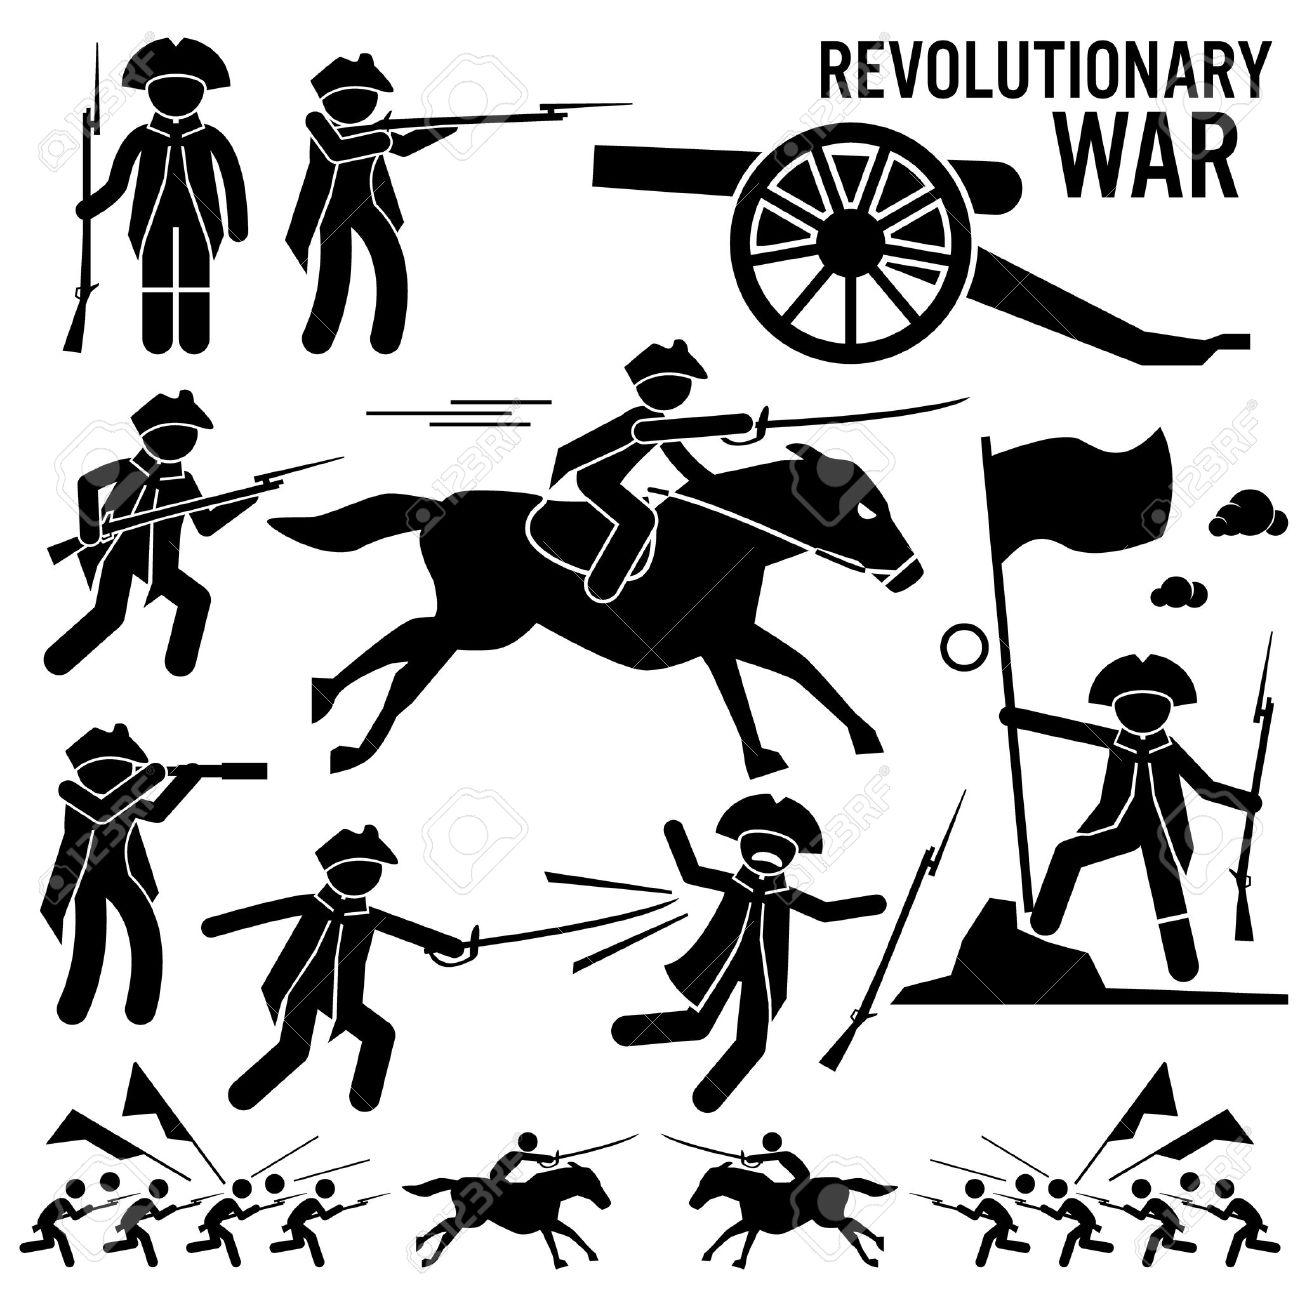 Revolutionary War Soldier Horse Gun Sword Fight Independence.